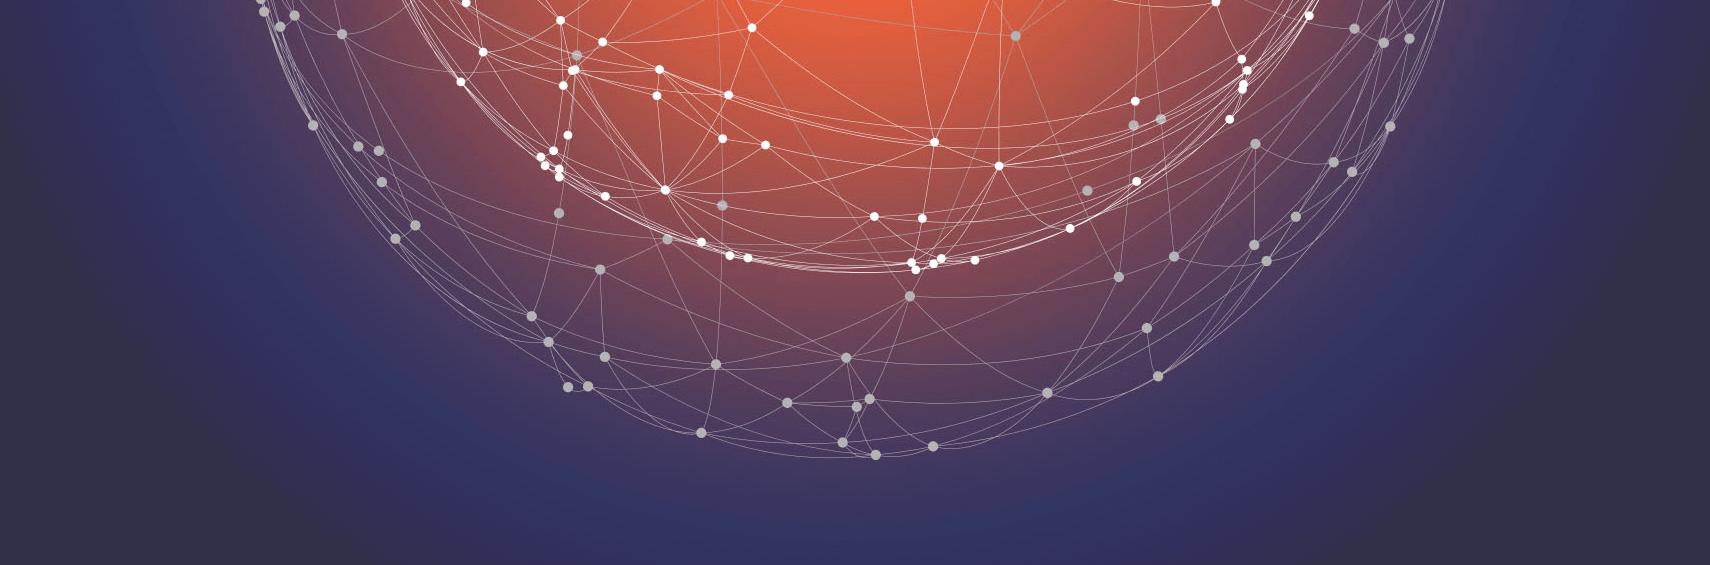 What billing should an Internet service provider choose